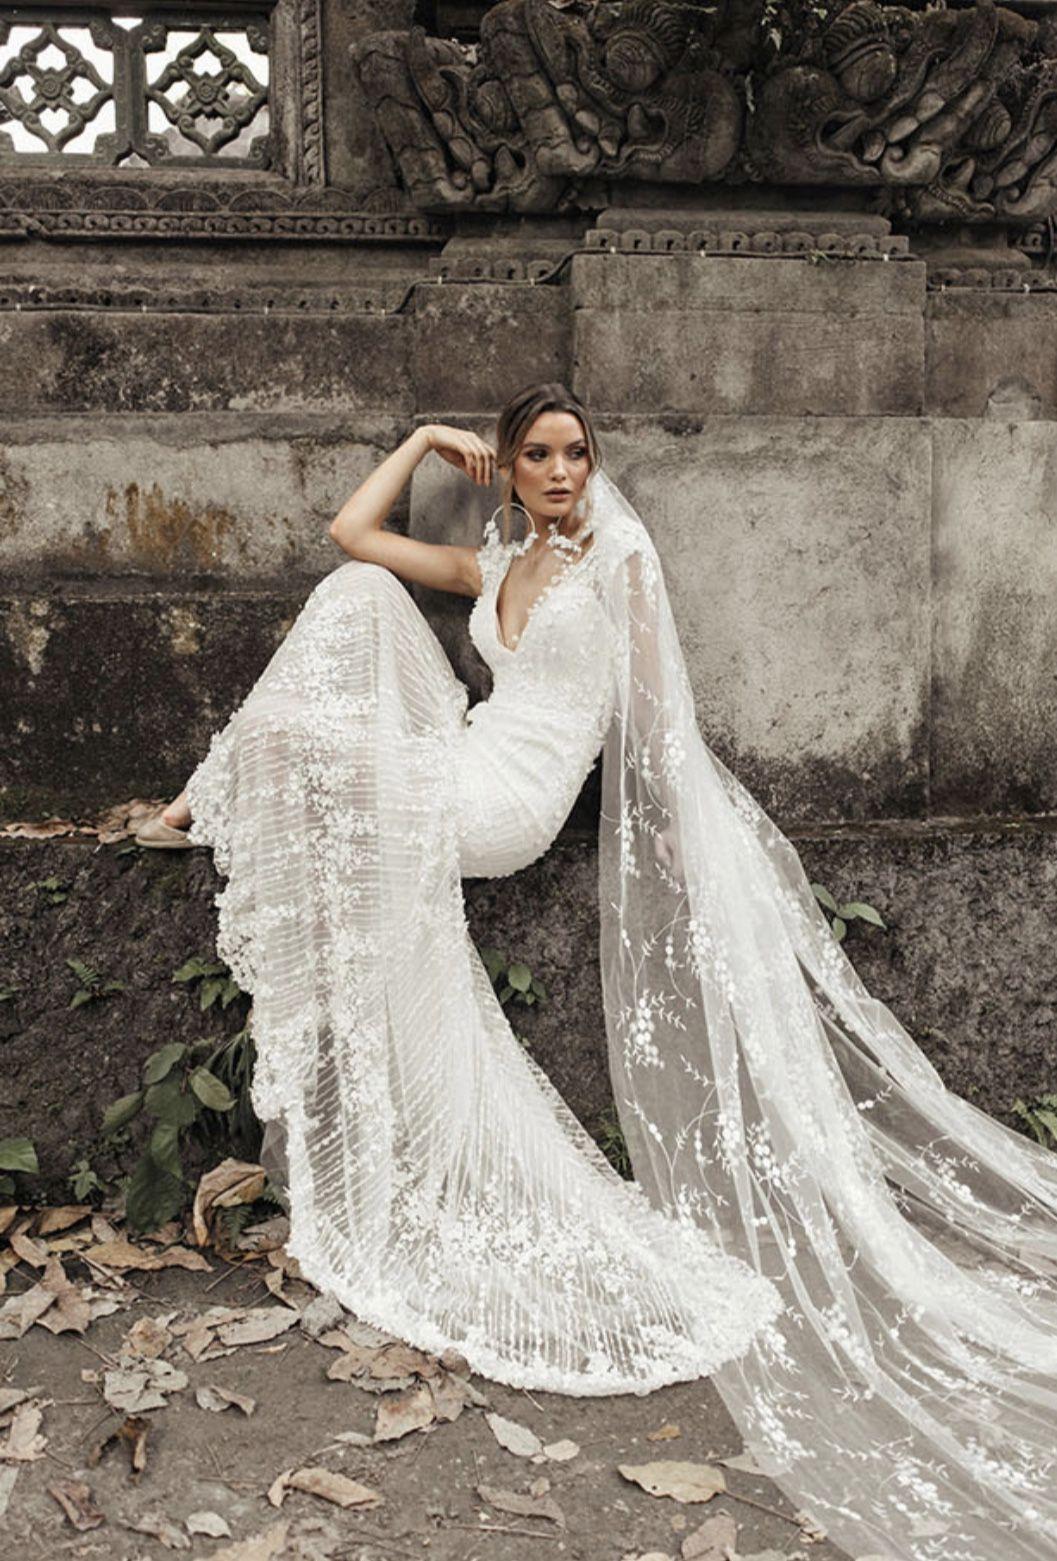 Tara Lauren In 2020 Consignment Wedding Dresses Bridal Dresses Wedding Dresses Lace